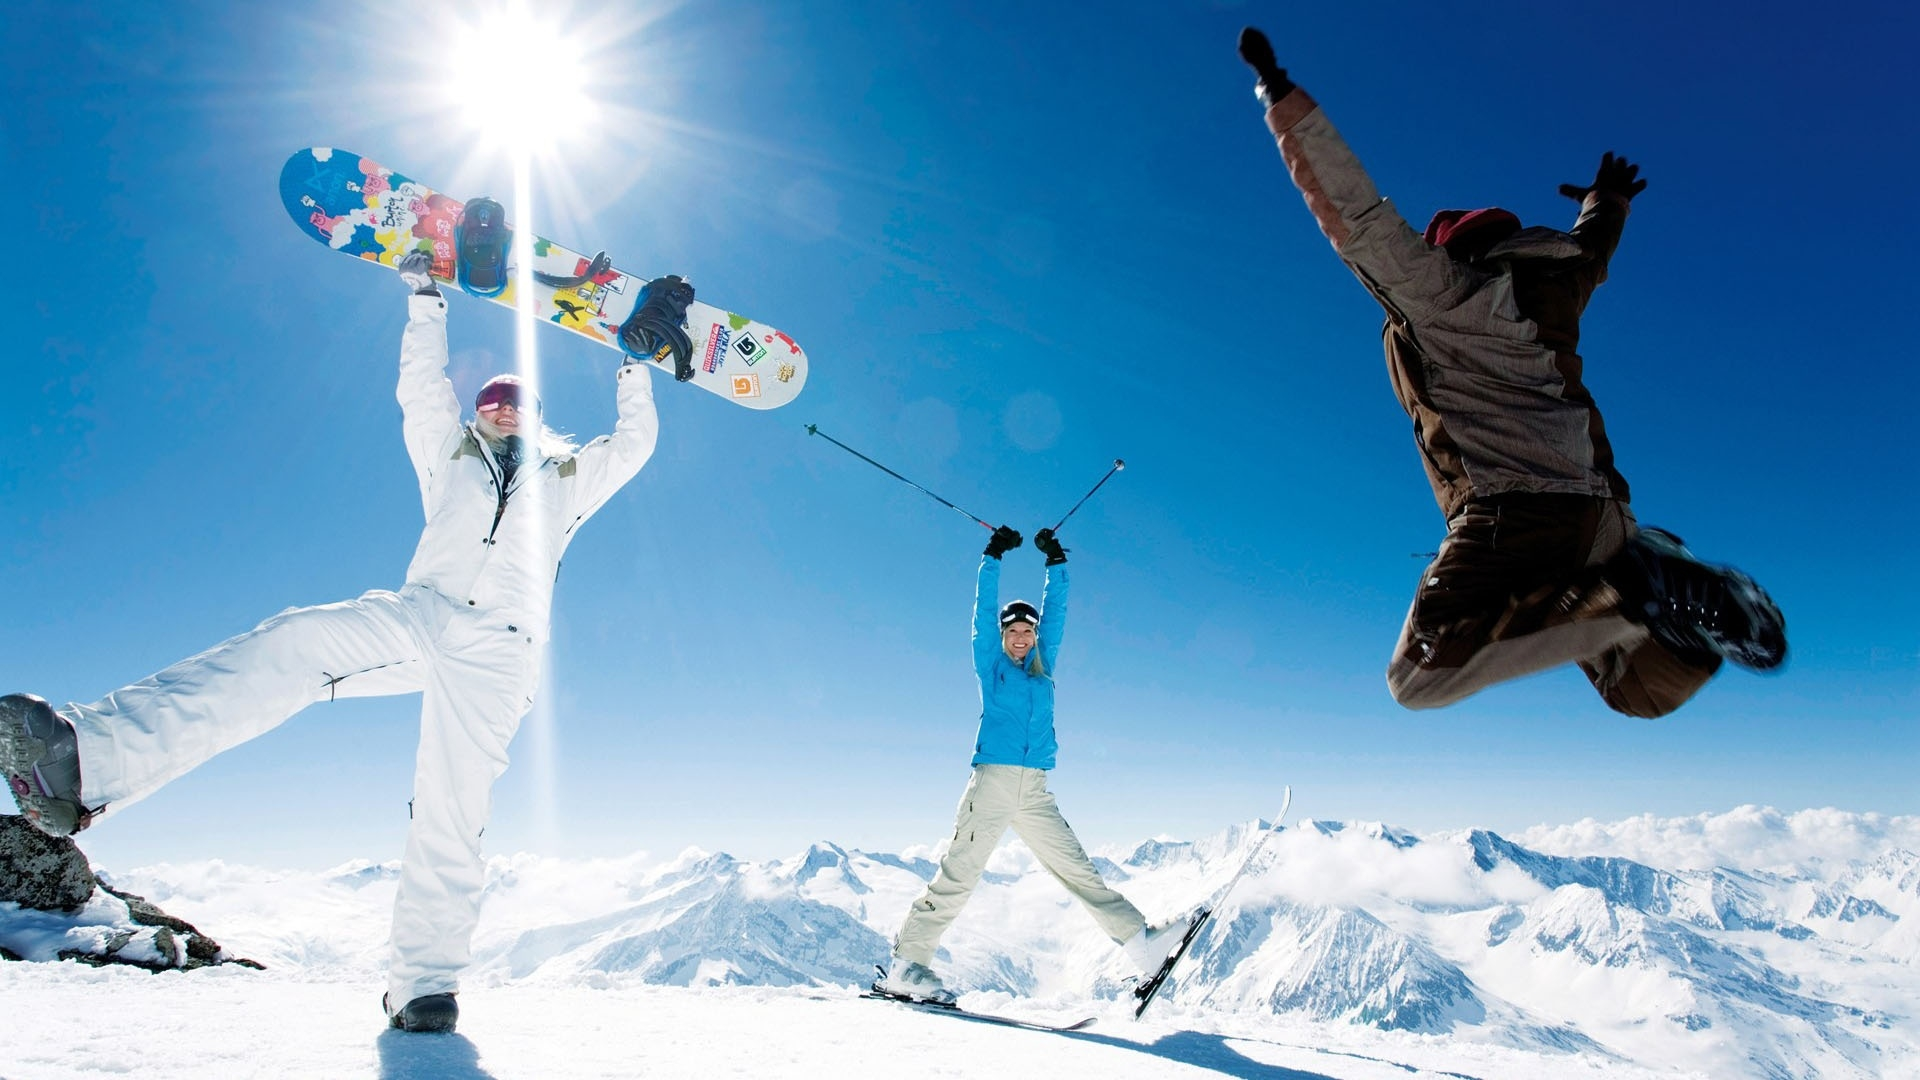 snowboard_skis_jump_pleasure_smiles_sun_11502_1920x1080